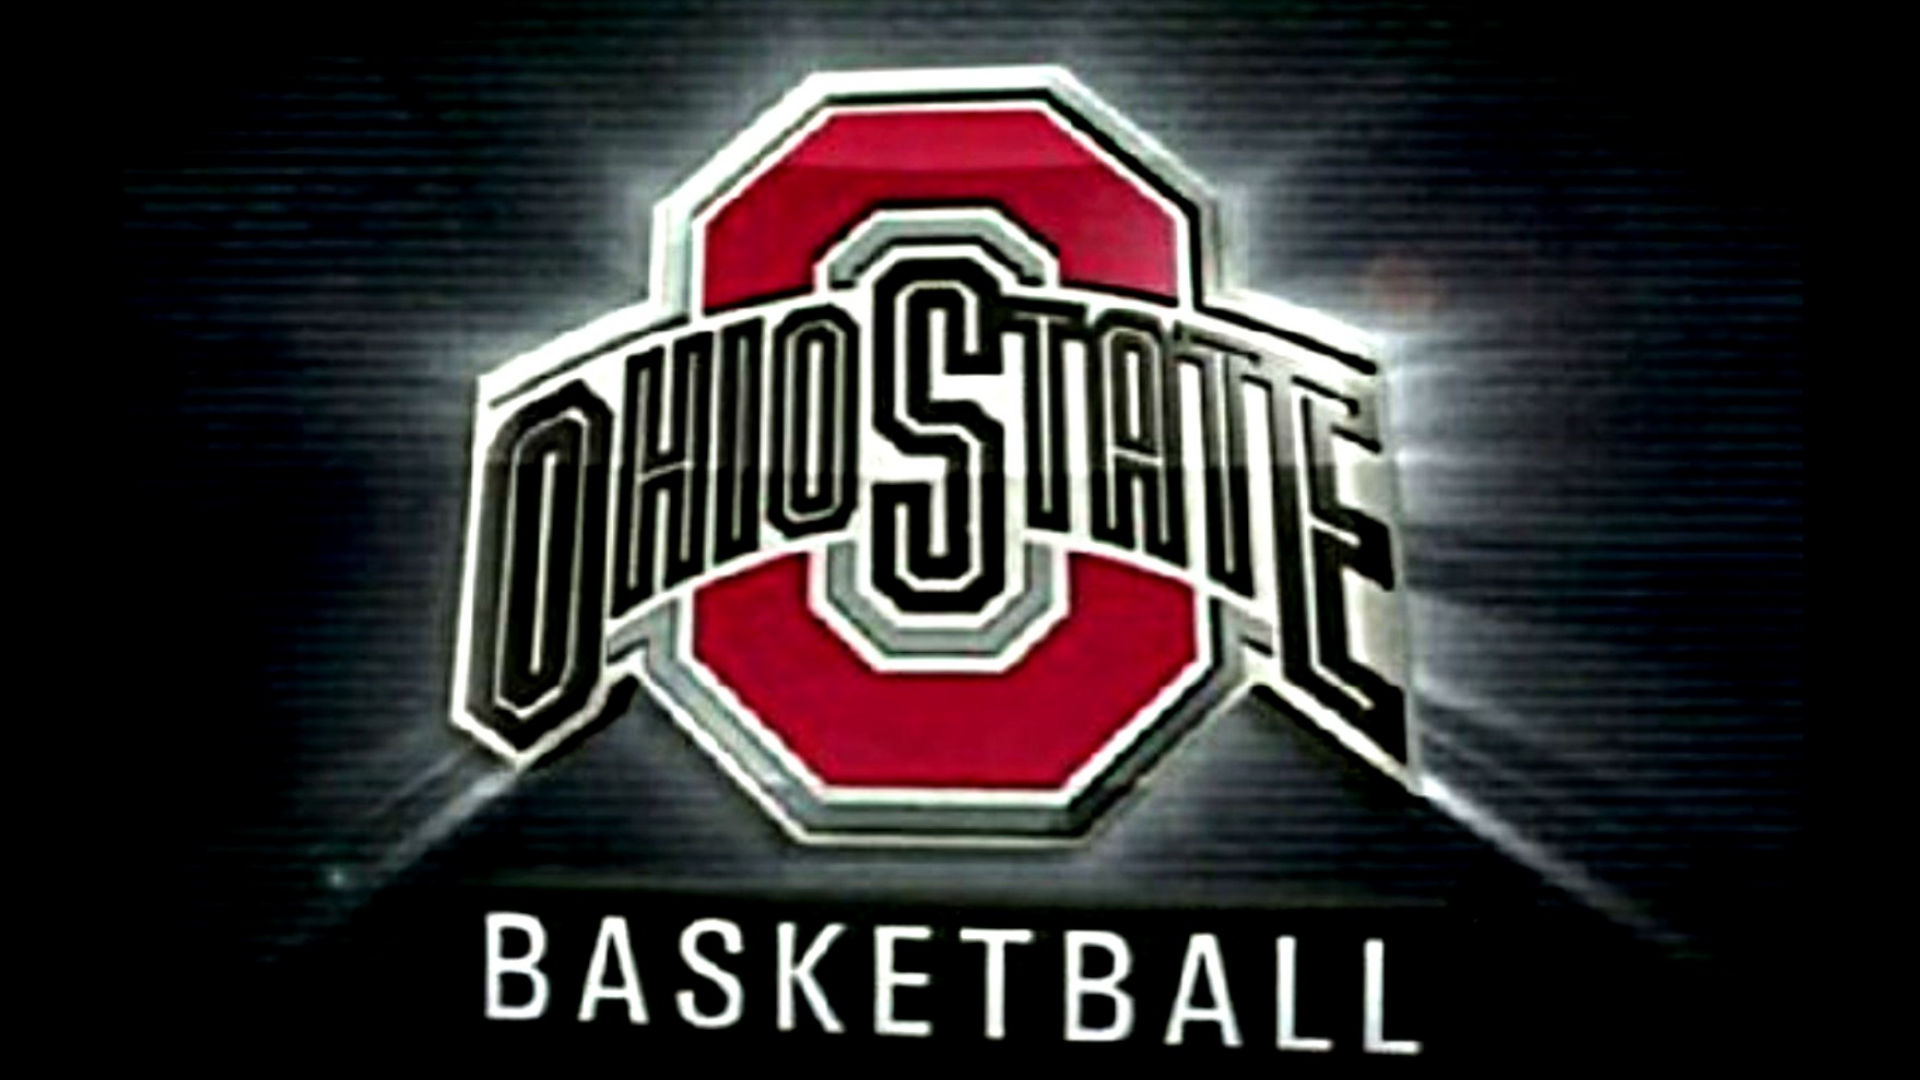 OHIO STATE BUCKEYES BASKETBALL RED BLOCK O - Basketball